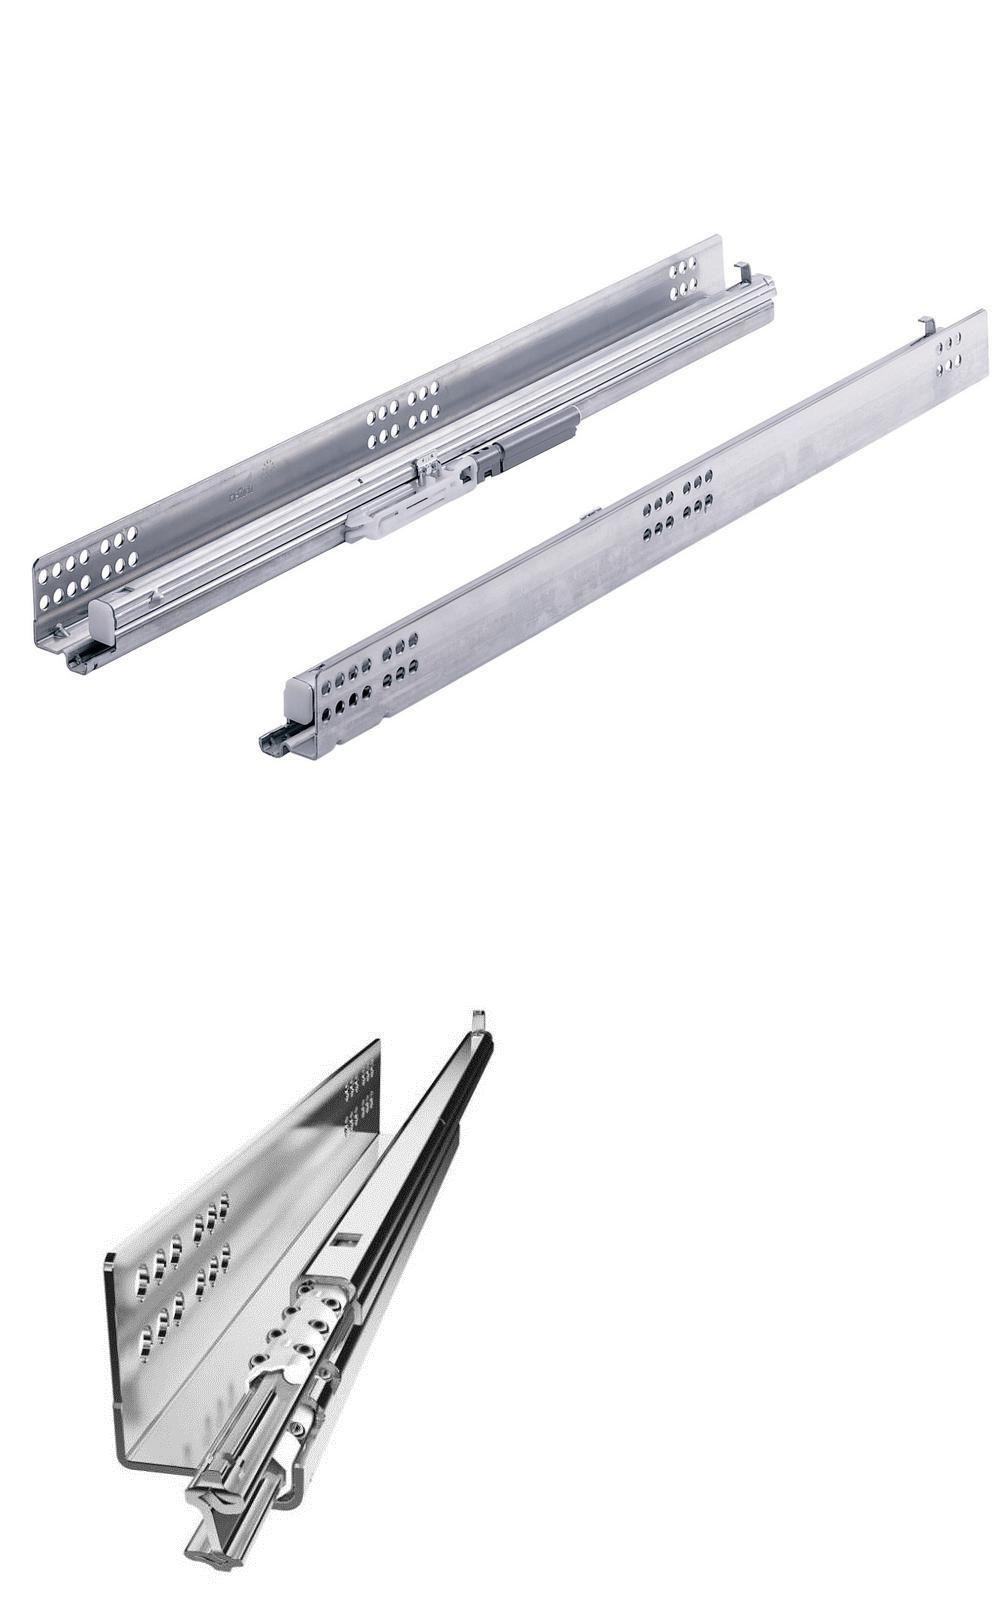 Drawer Slides 134642 Everbilt 15 Full Extension Undermount Soft